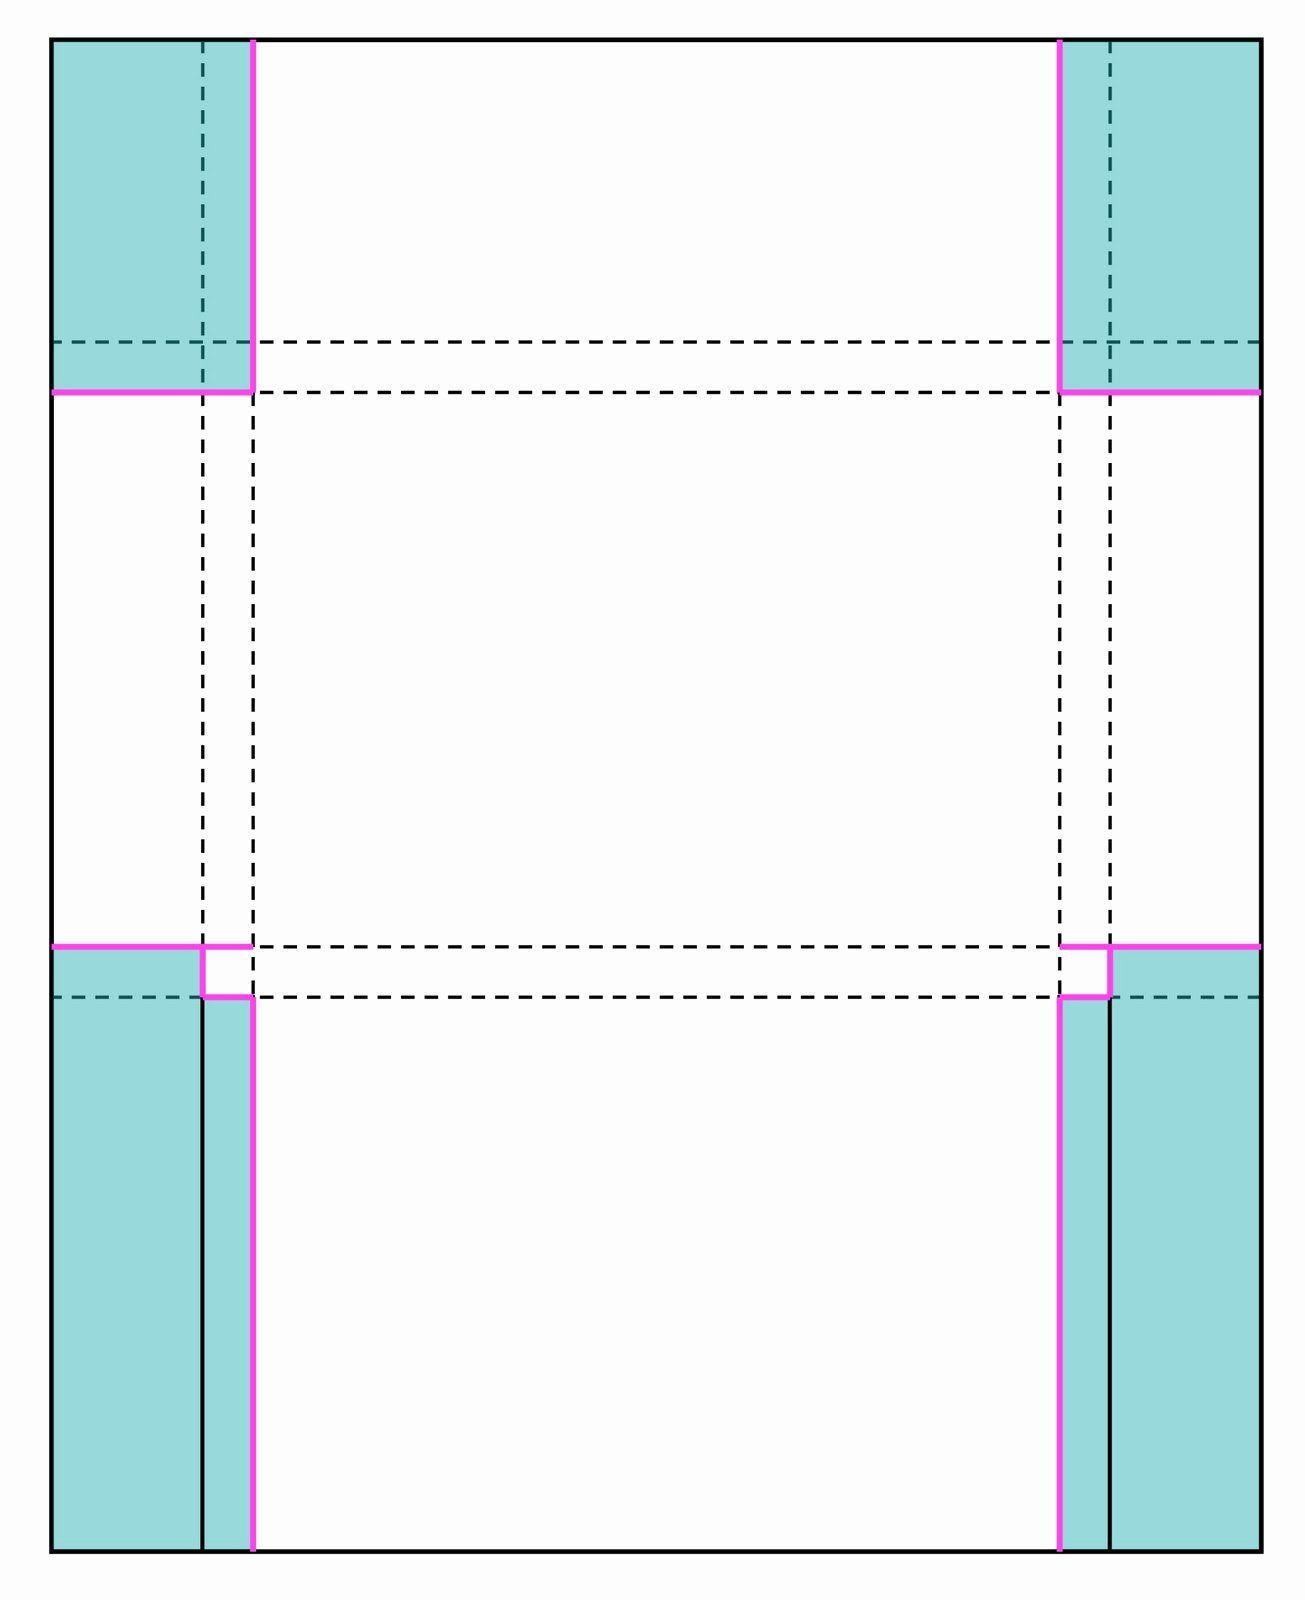 001 Remarkable Gift Card Envelope Template High Definition  Templates Voucher Diy Free PrintableFull